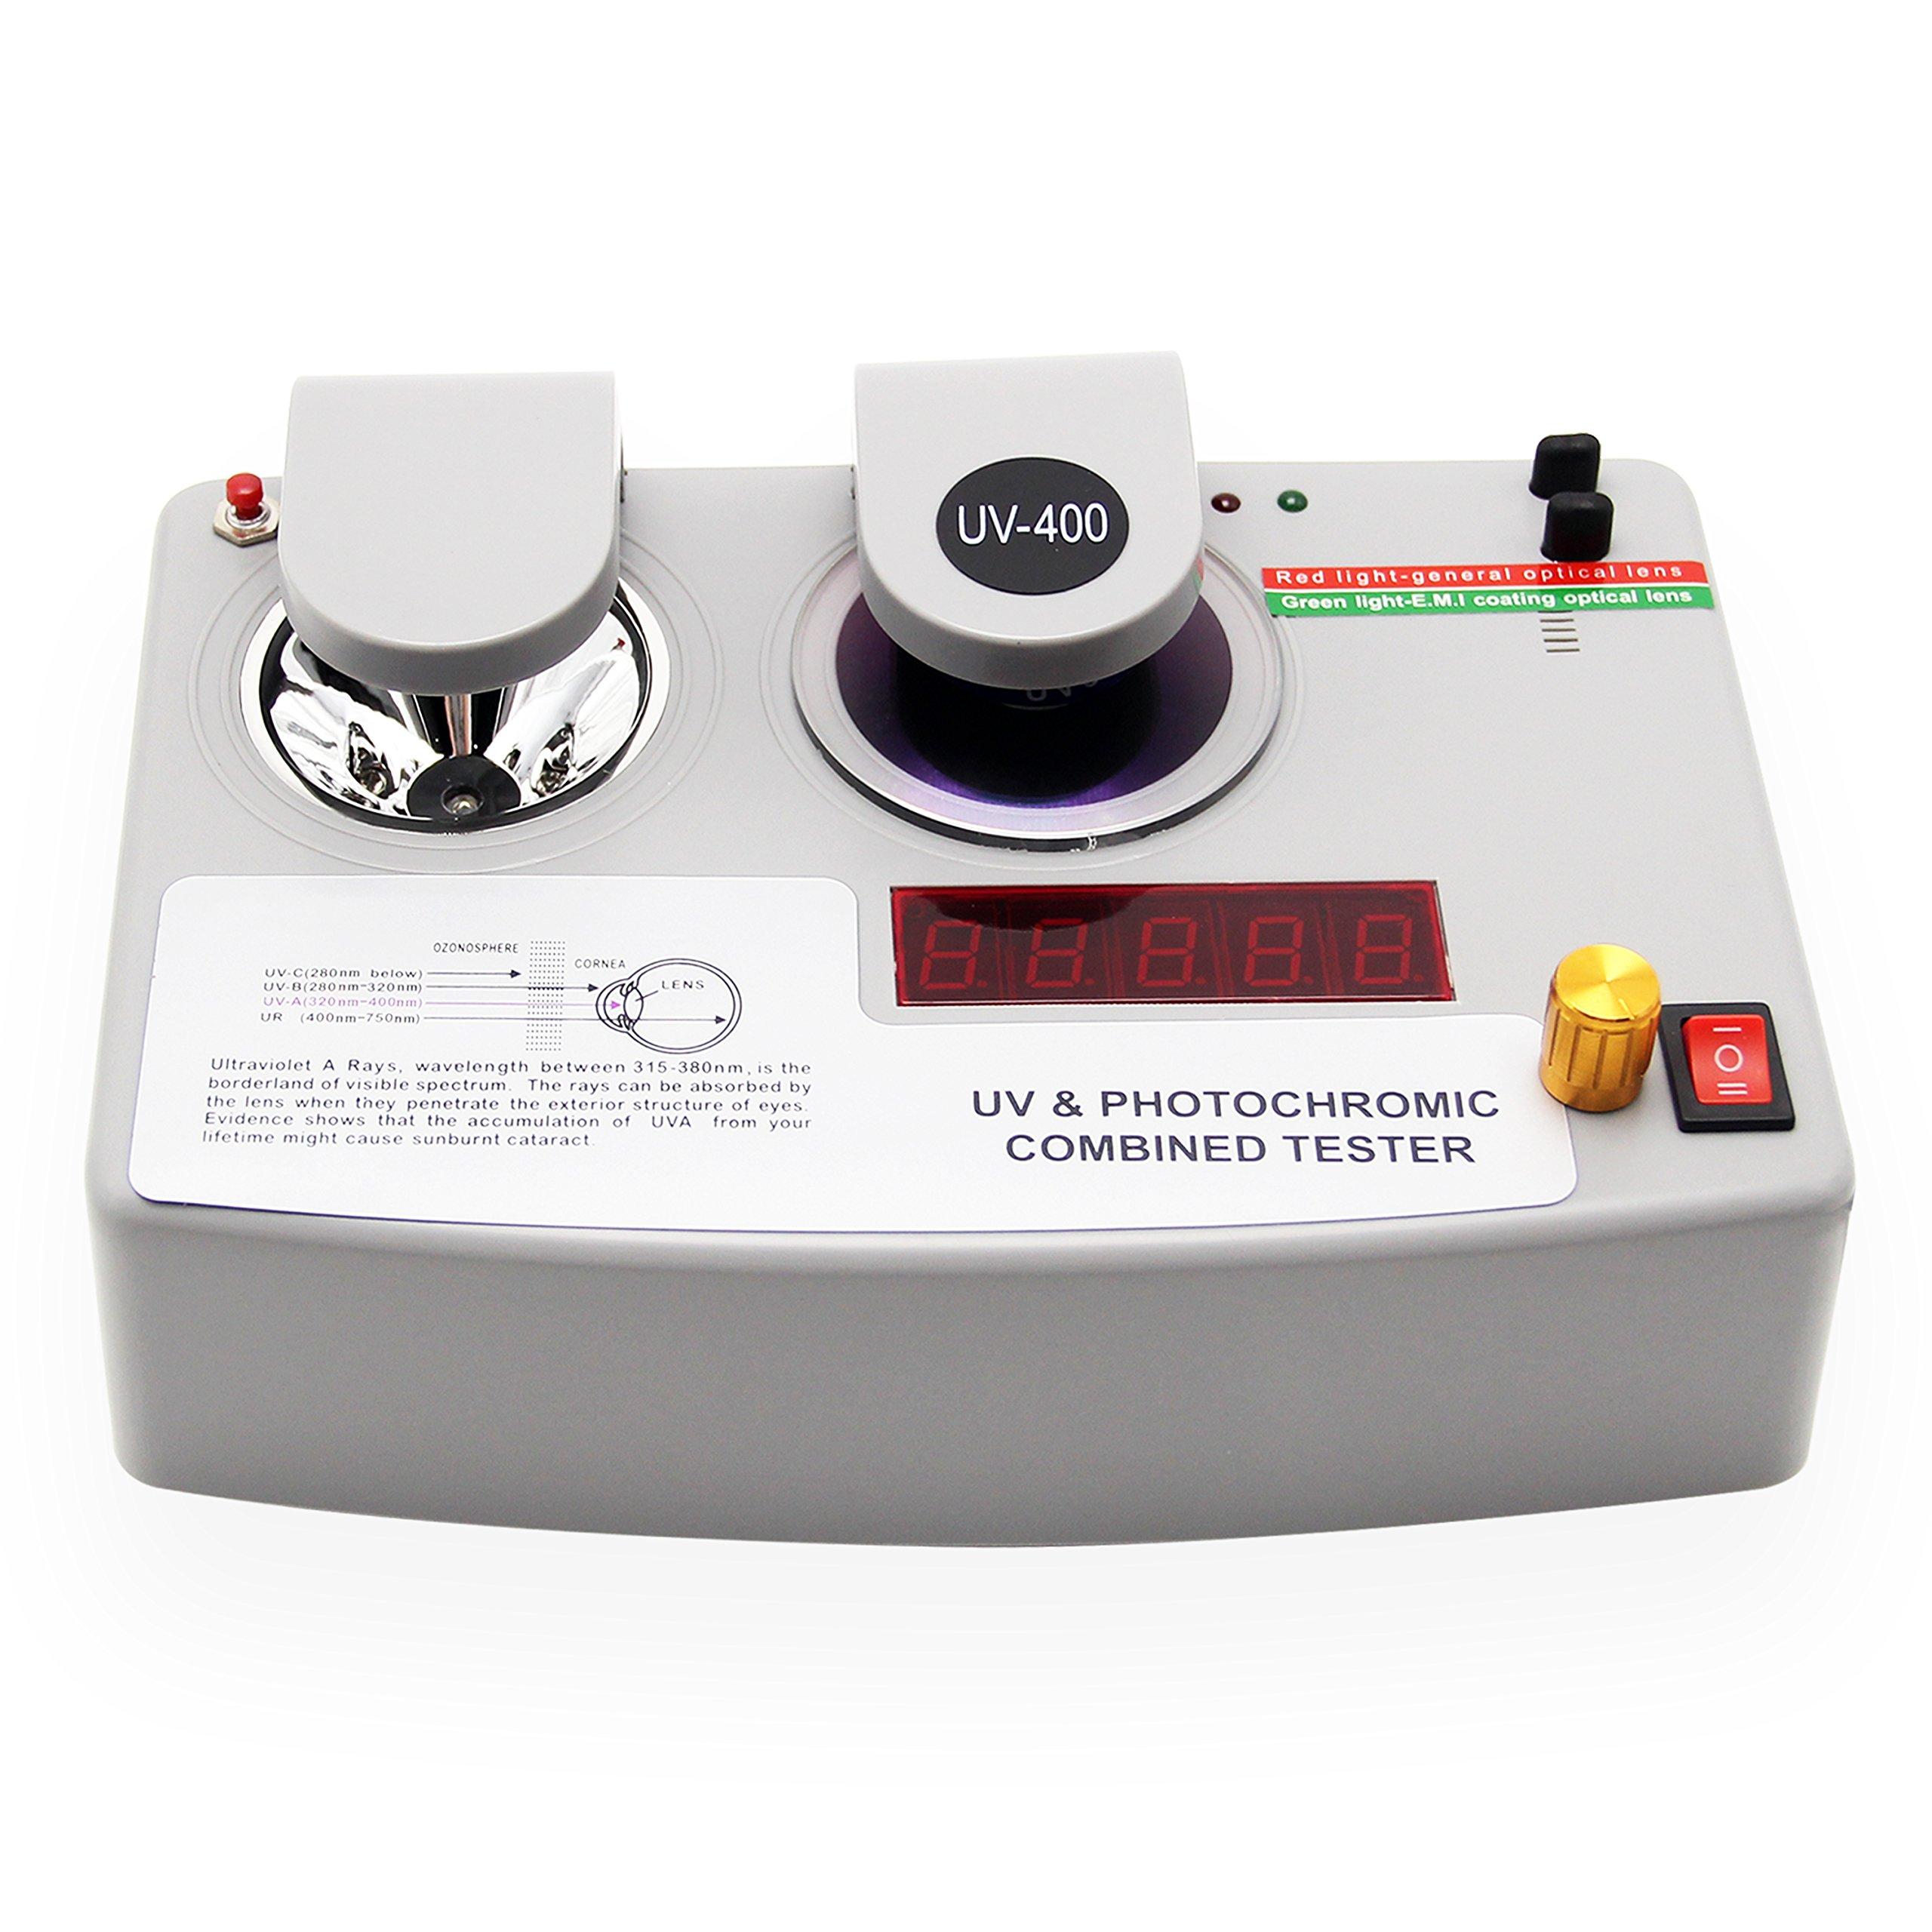 Huanyu Photochromic Coating UV Lens Tester Detector Measurer Lens Testing Machine 3 Function in 1 Set